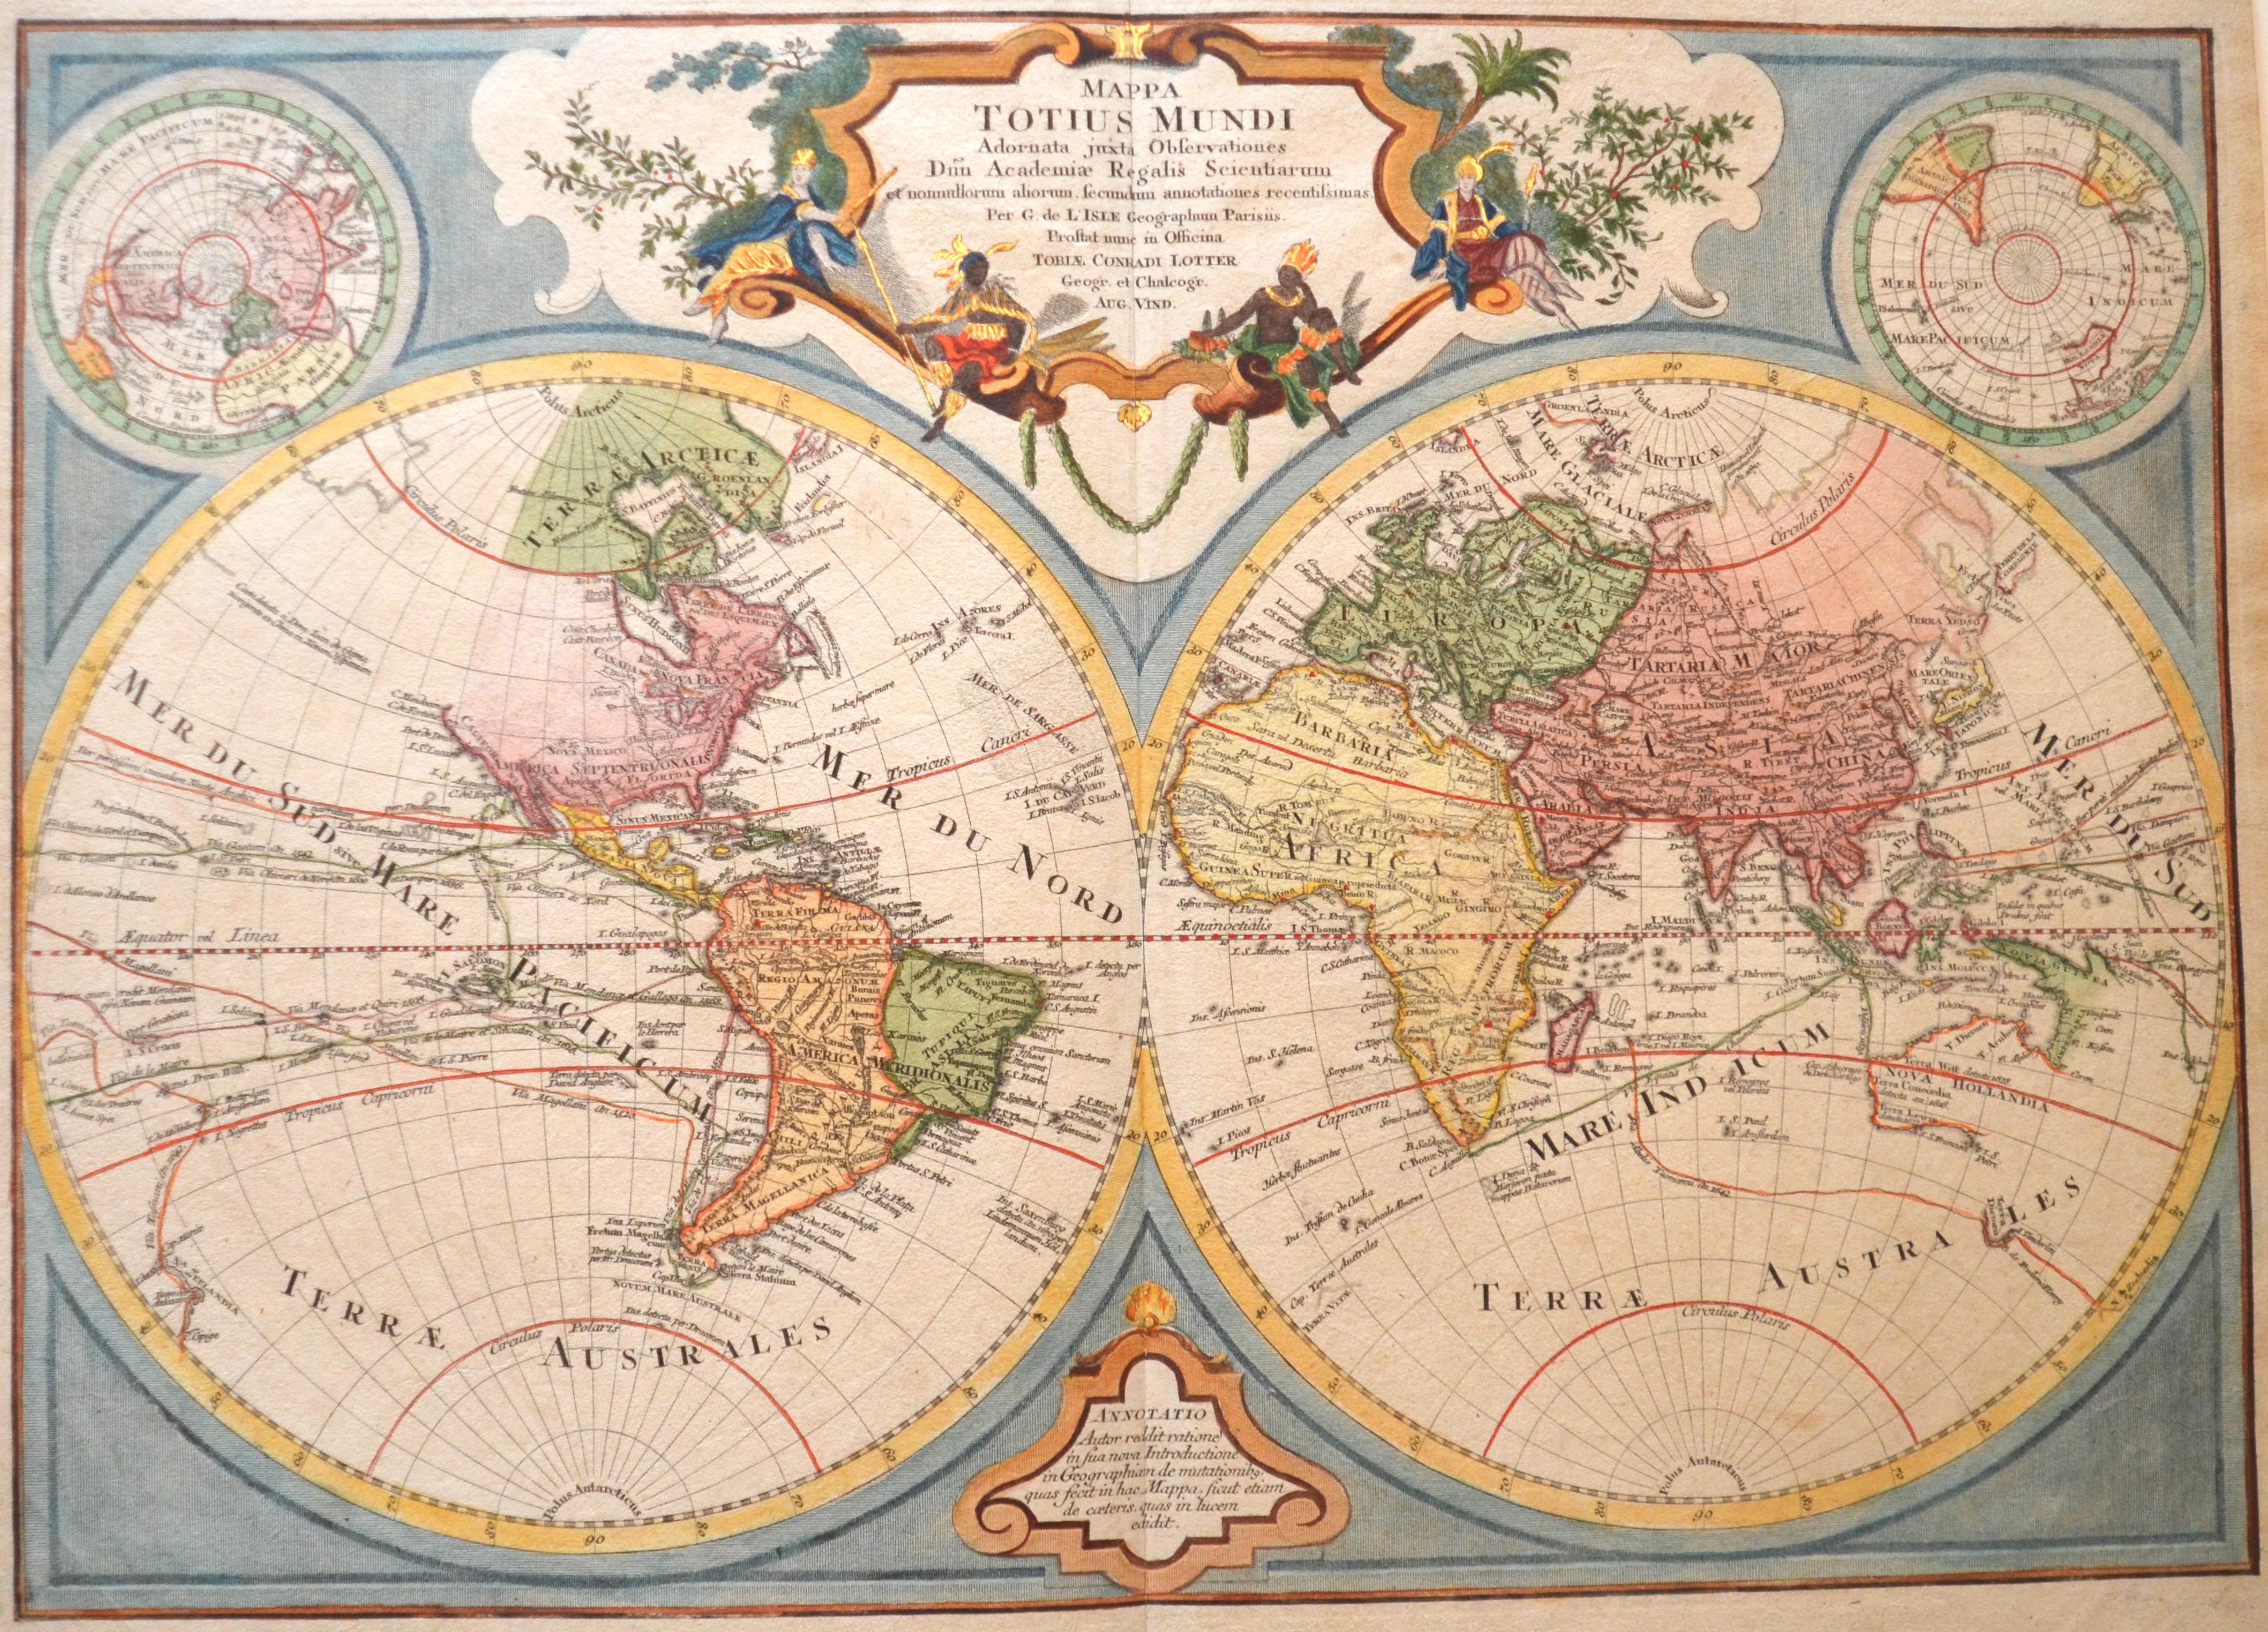 Lotter  Mappa Totius Mundi Adornata juxta Observationes…